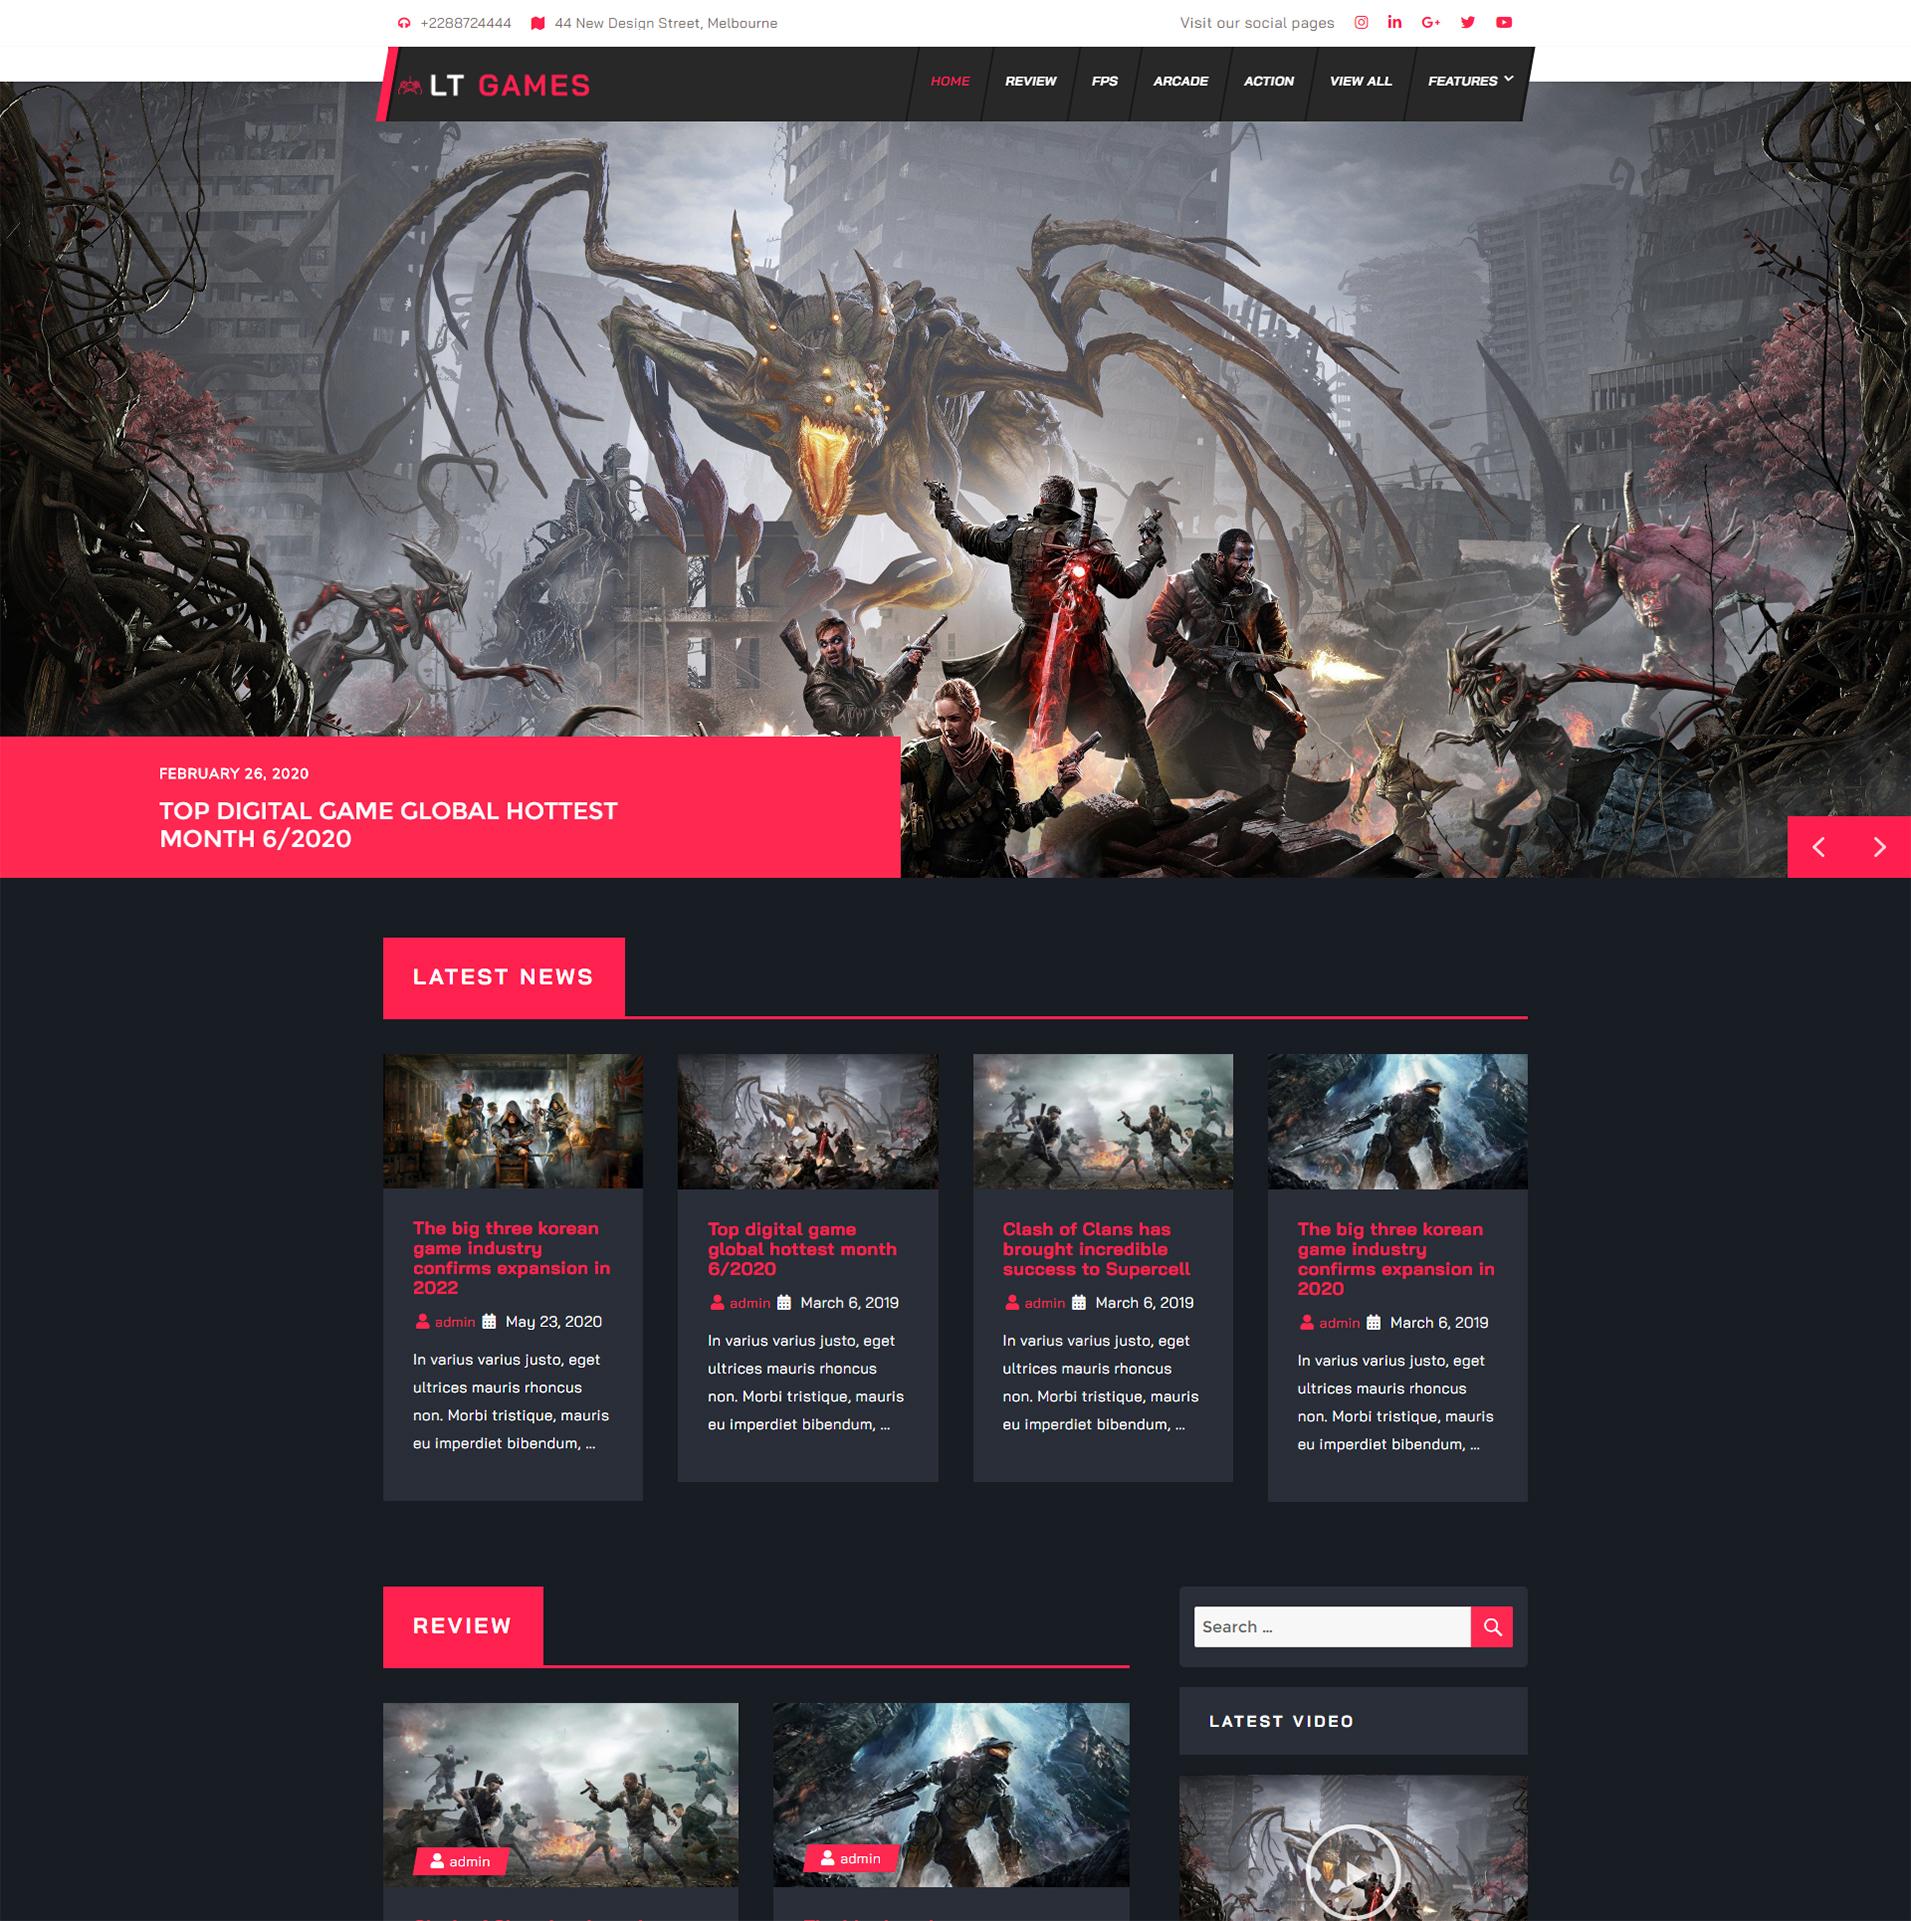 lt-games-full-screenshot